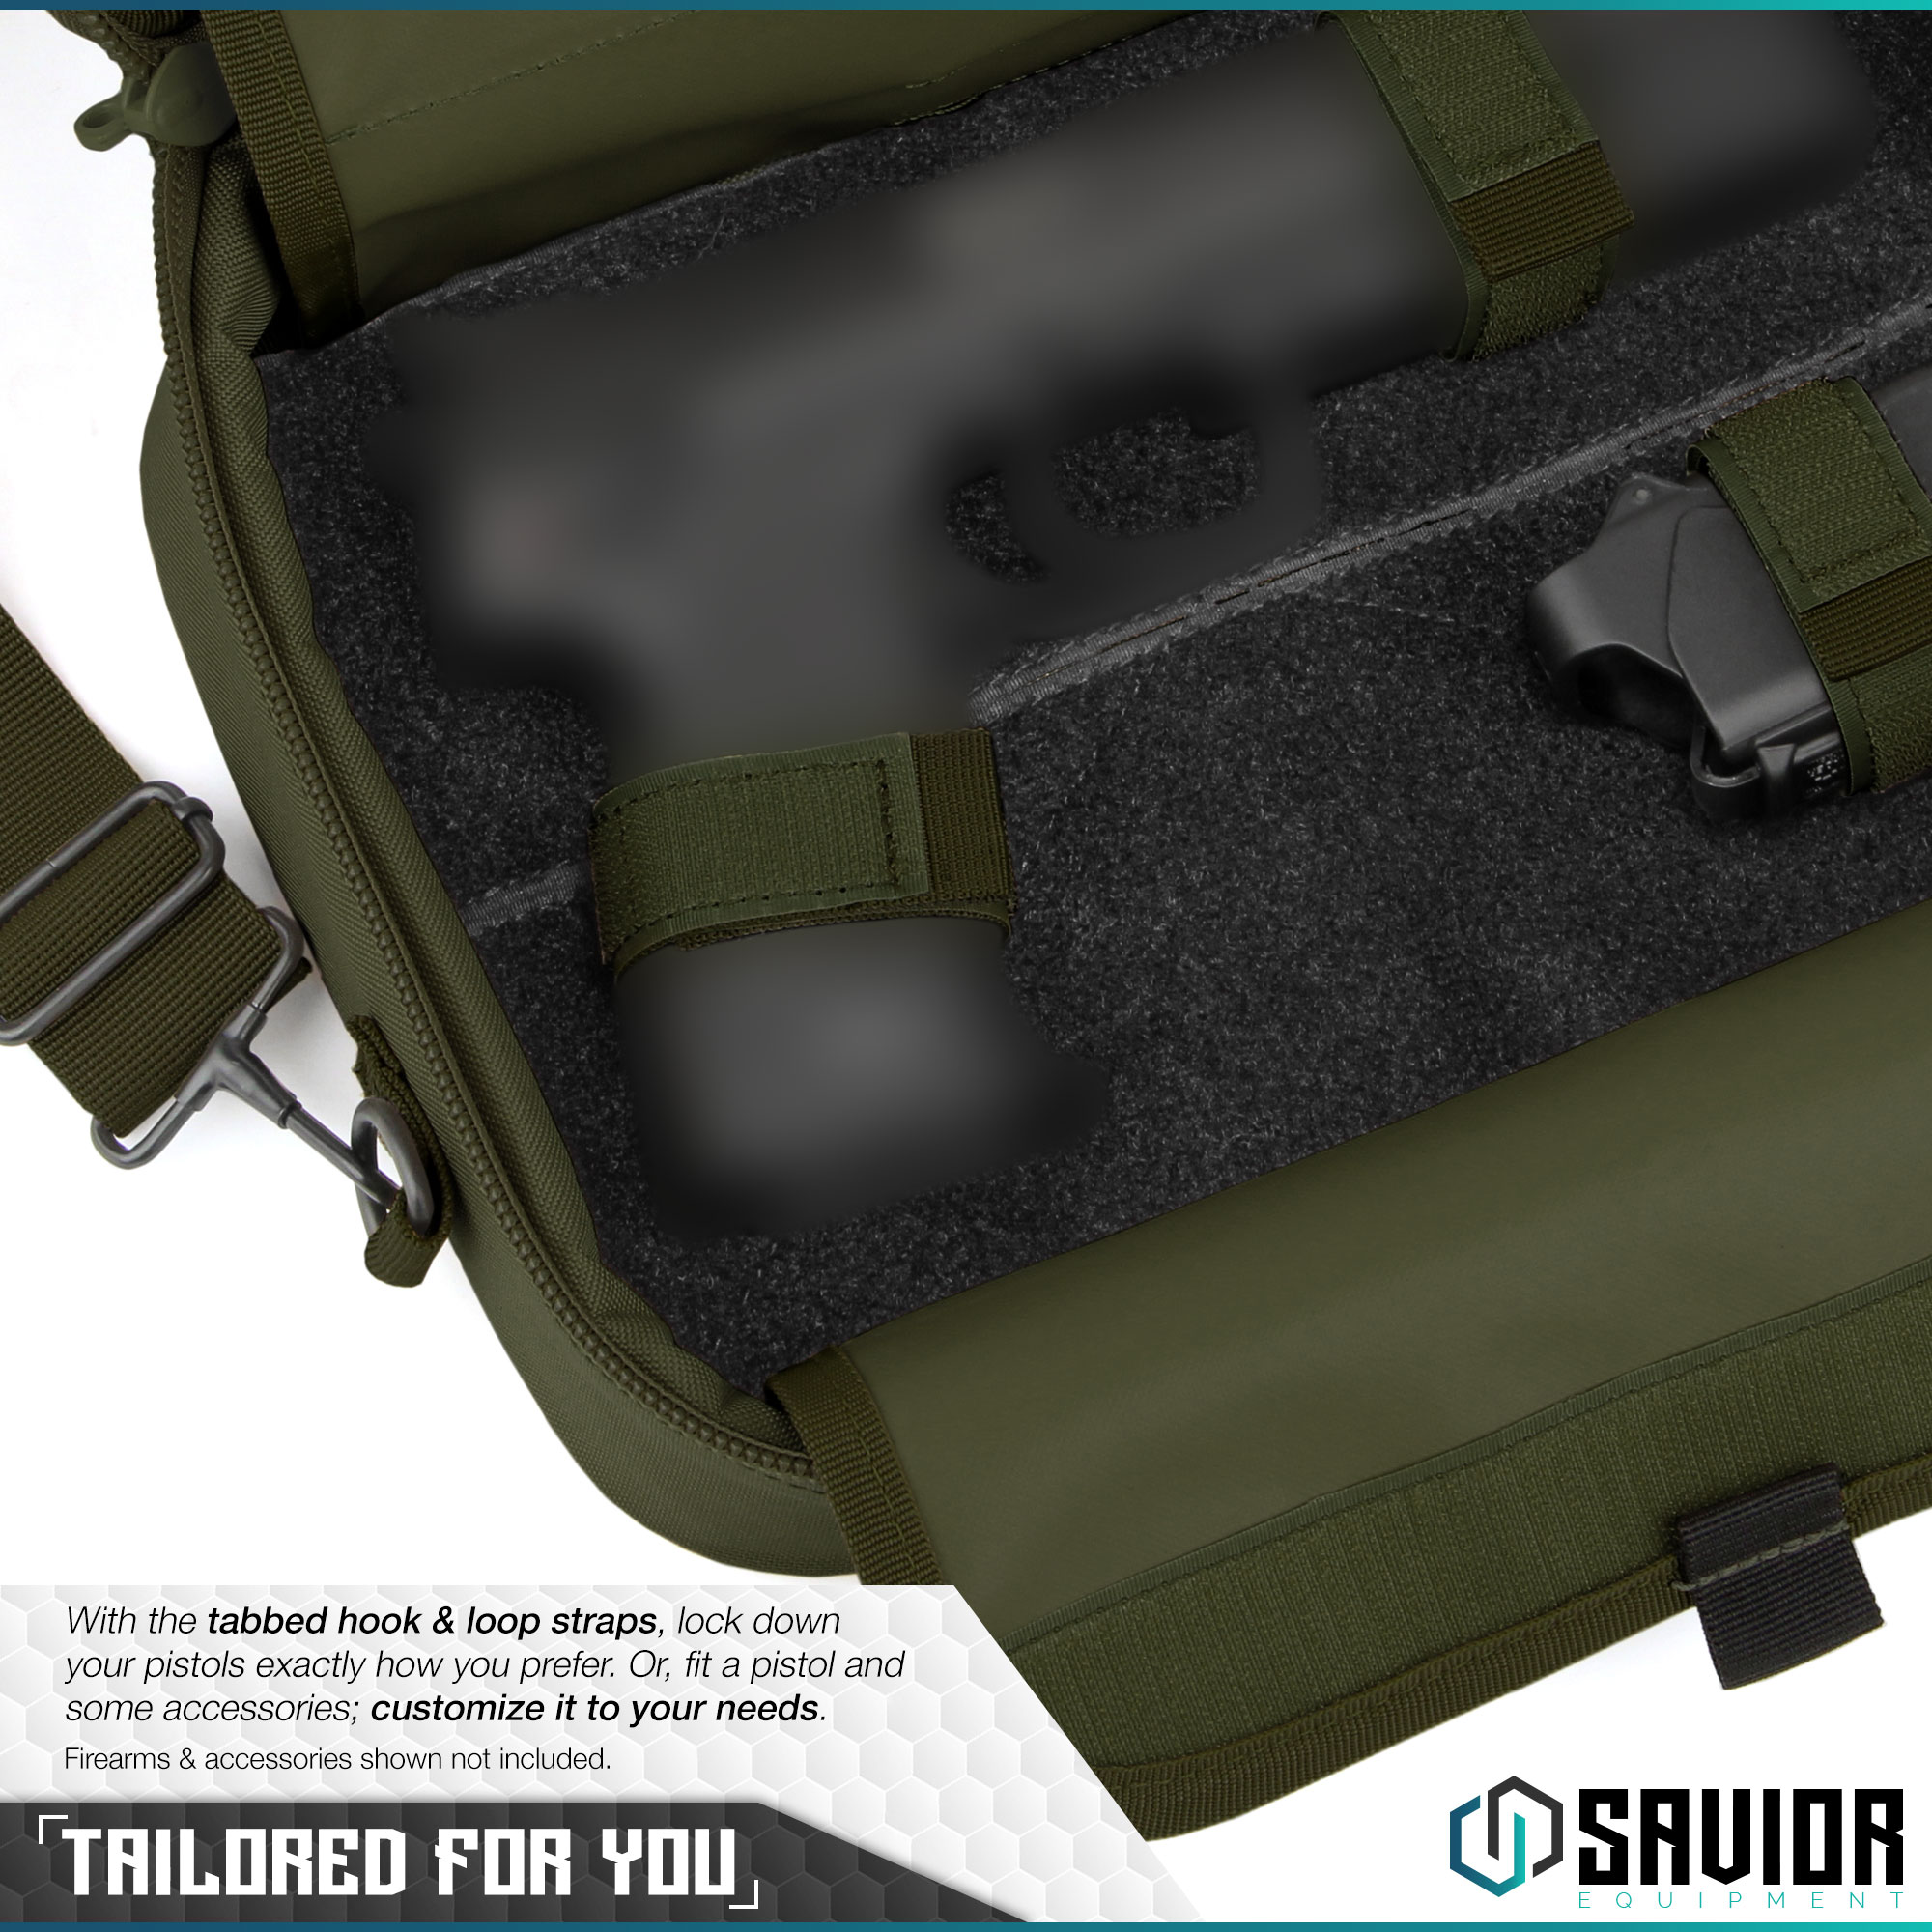 034-SAVIOR-034-Padded-Discreet-Double-Handgun-Bag-Pistol-Storage-Case-w-Mag-Pouch-Slot thumbnail 22